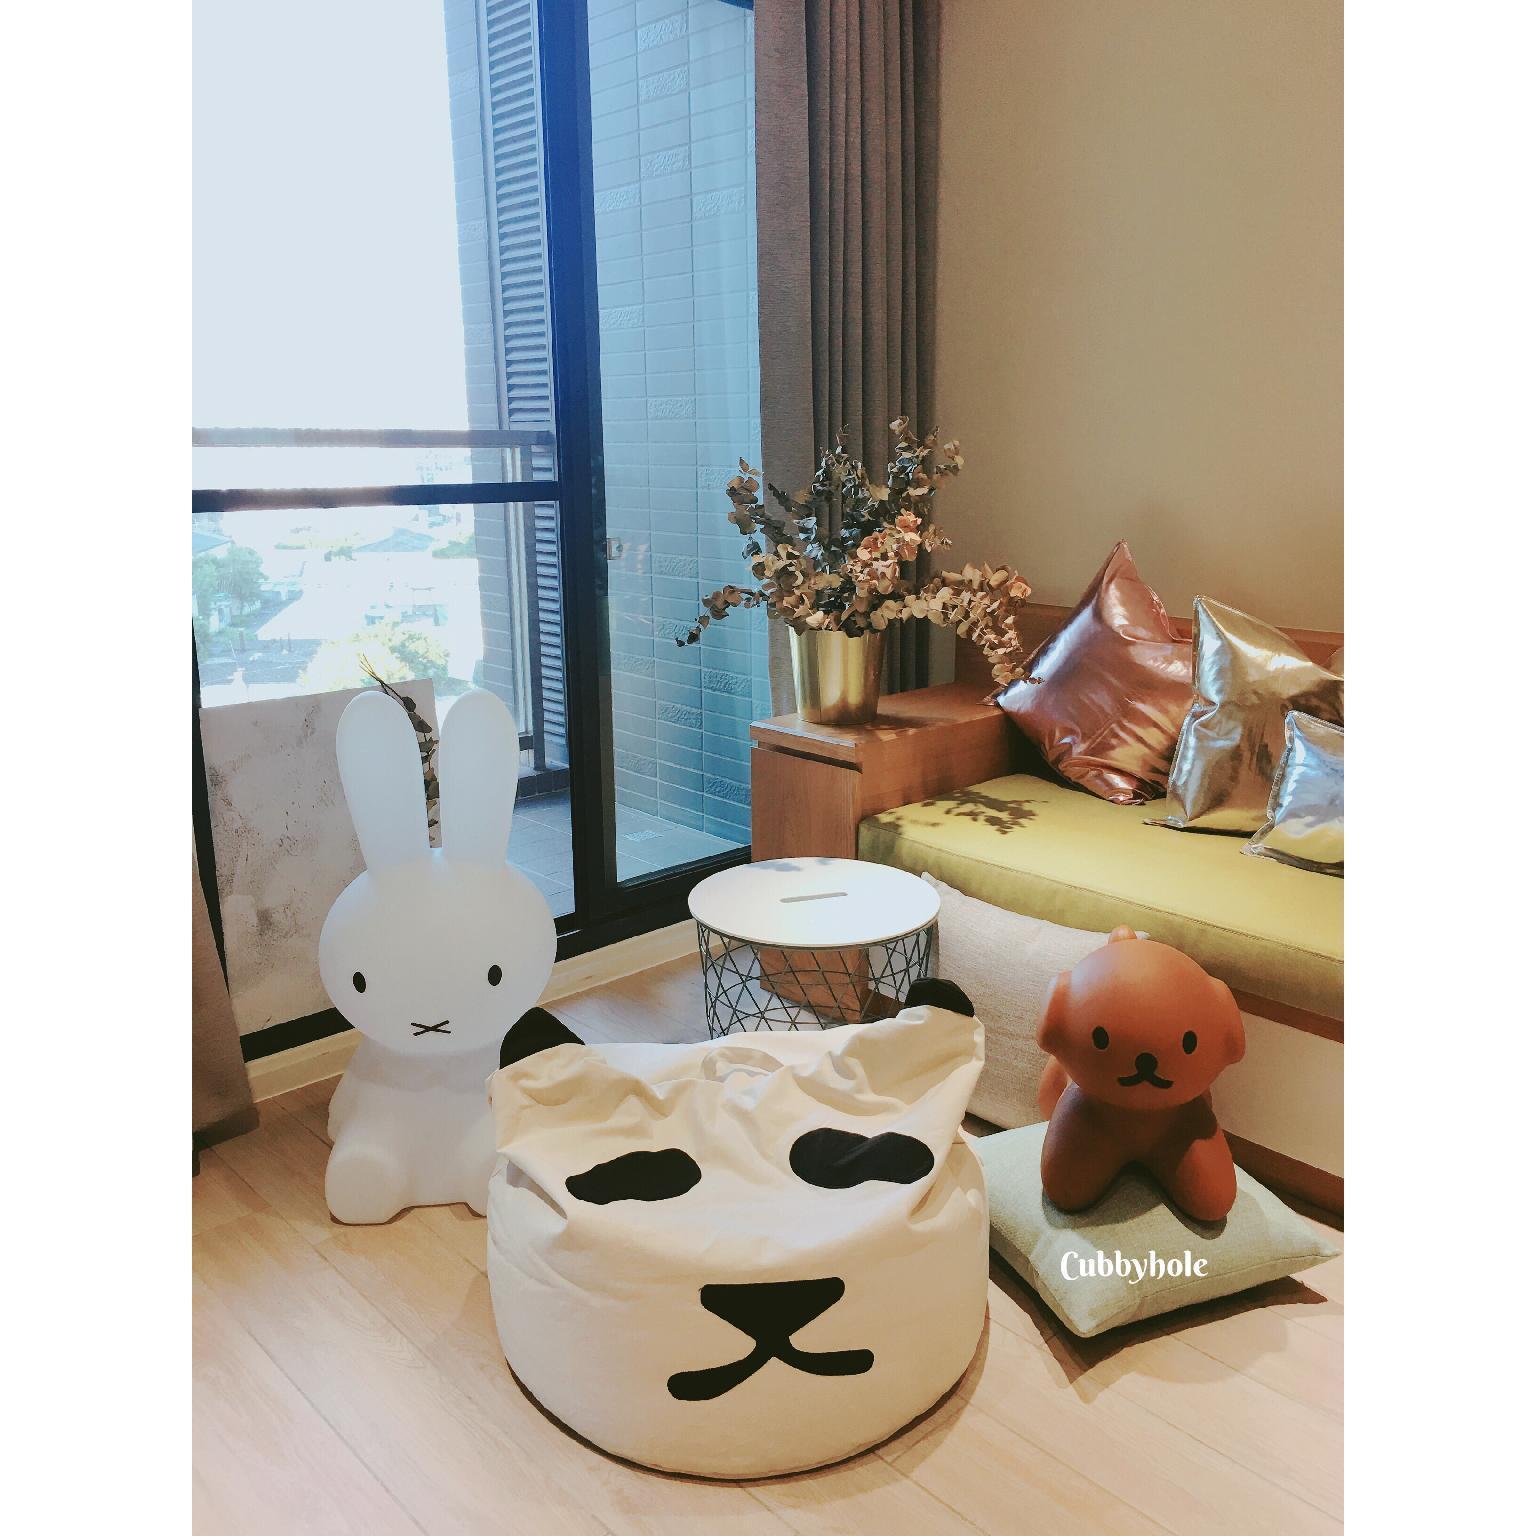 Jiaoxi Hotspring Cubbyhole Family Friendly